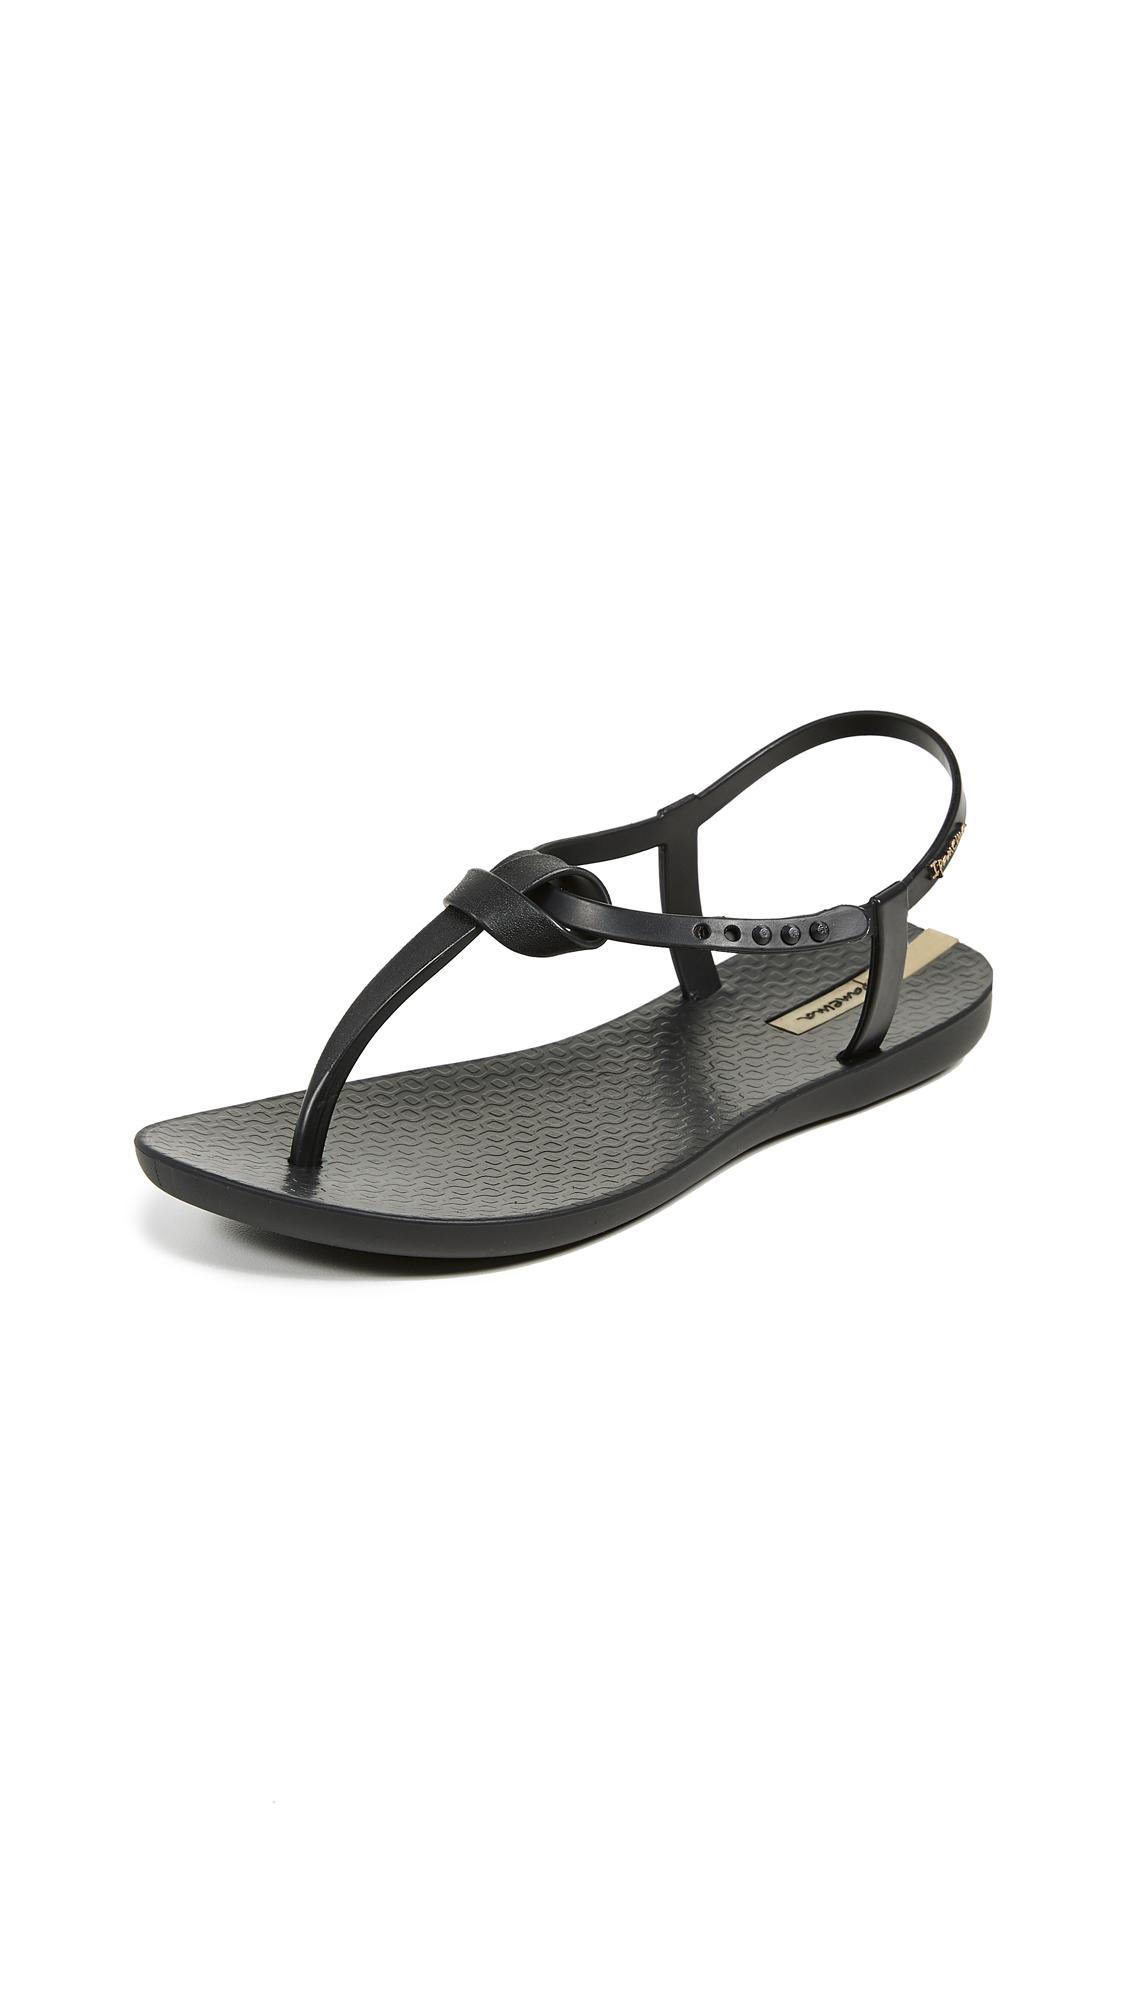 b3e219b376a3 Ipanema Women s Ellie Thong Sandals In Black Black